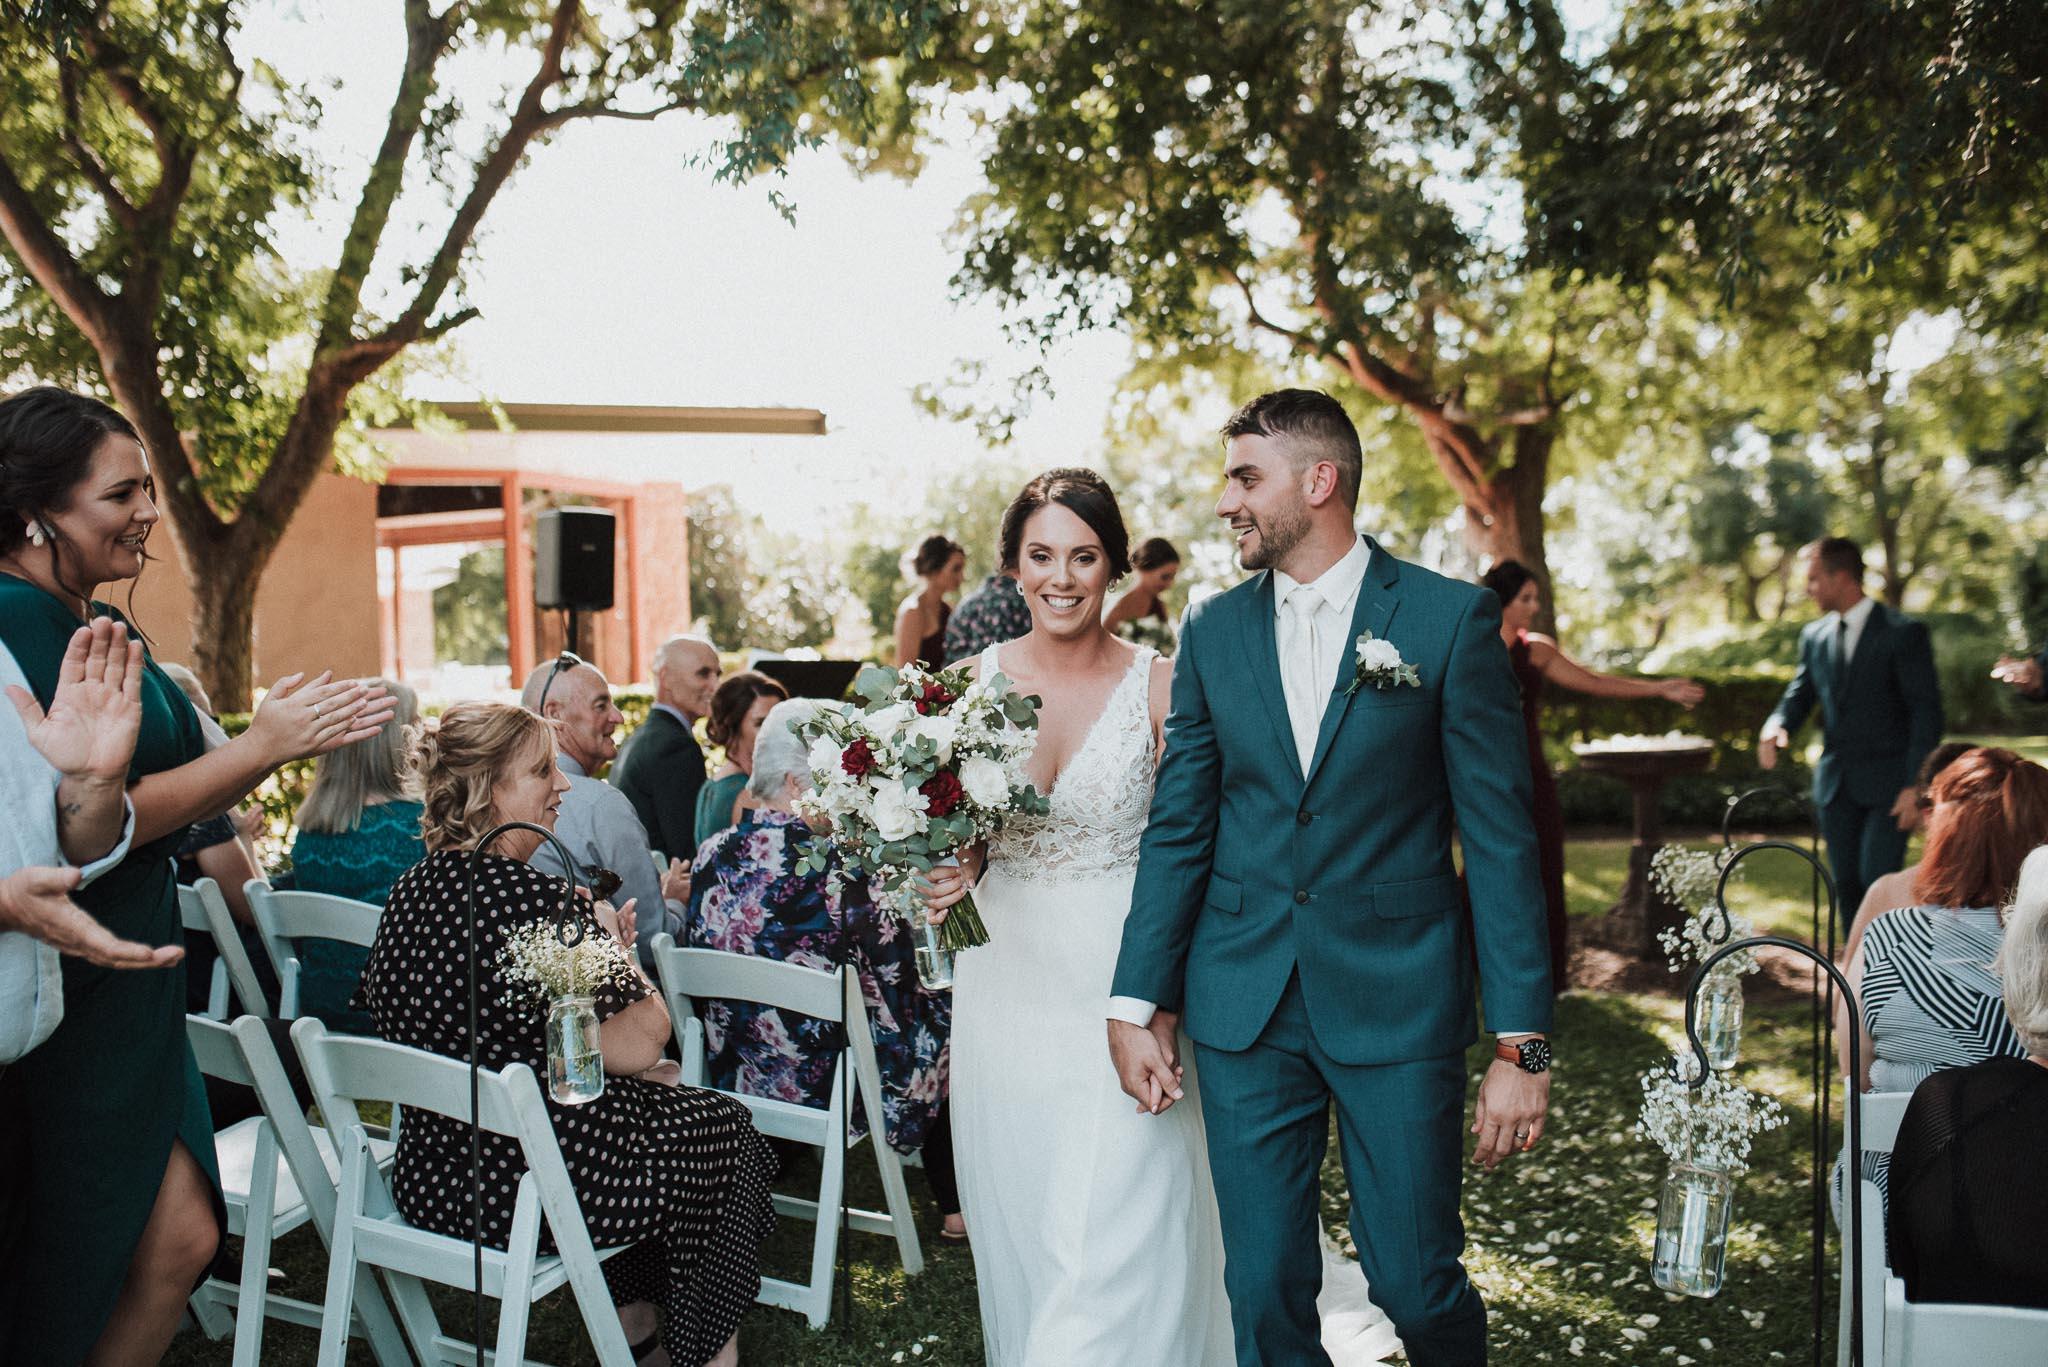 MECURE-RESORT-WEDDING-KING-WEB-104.jpg